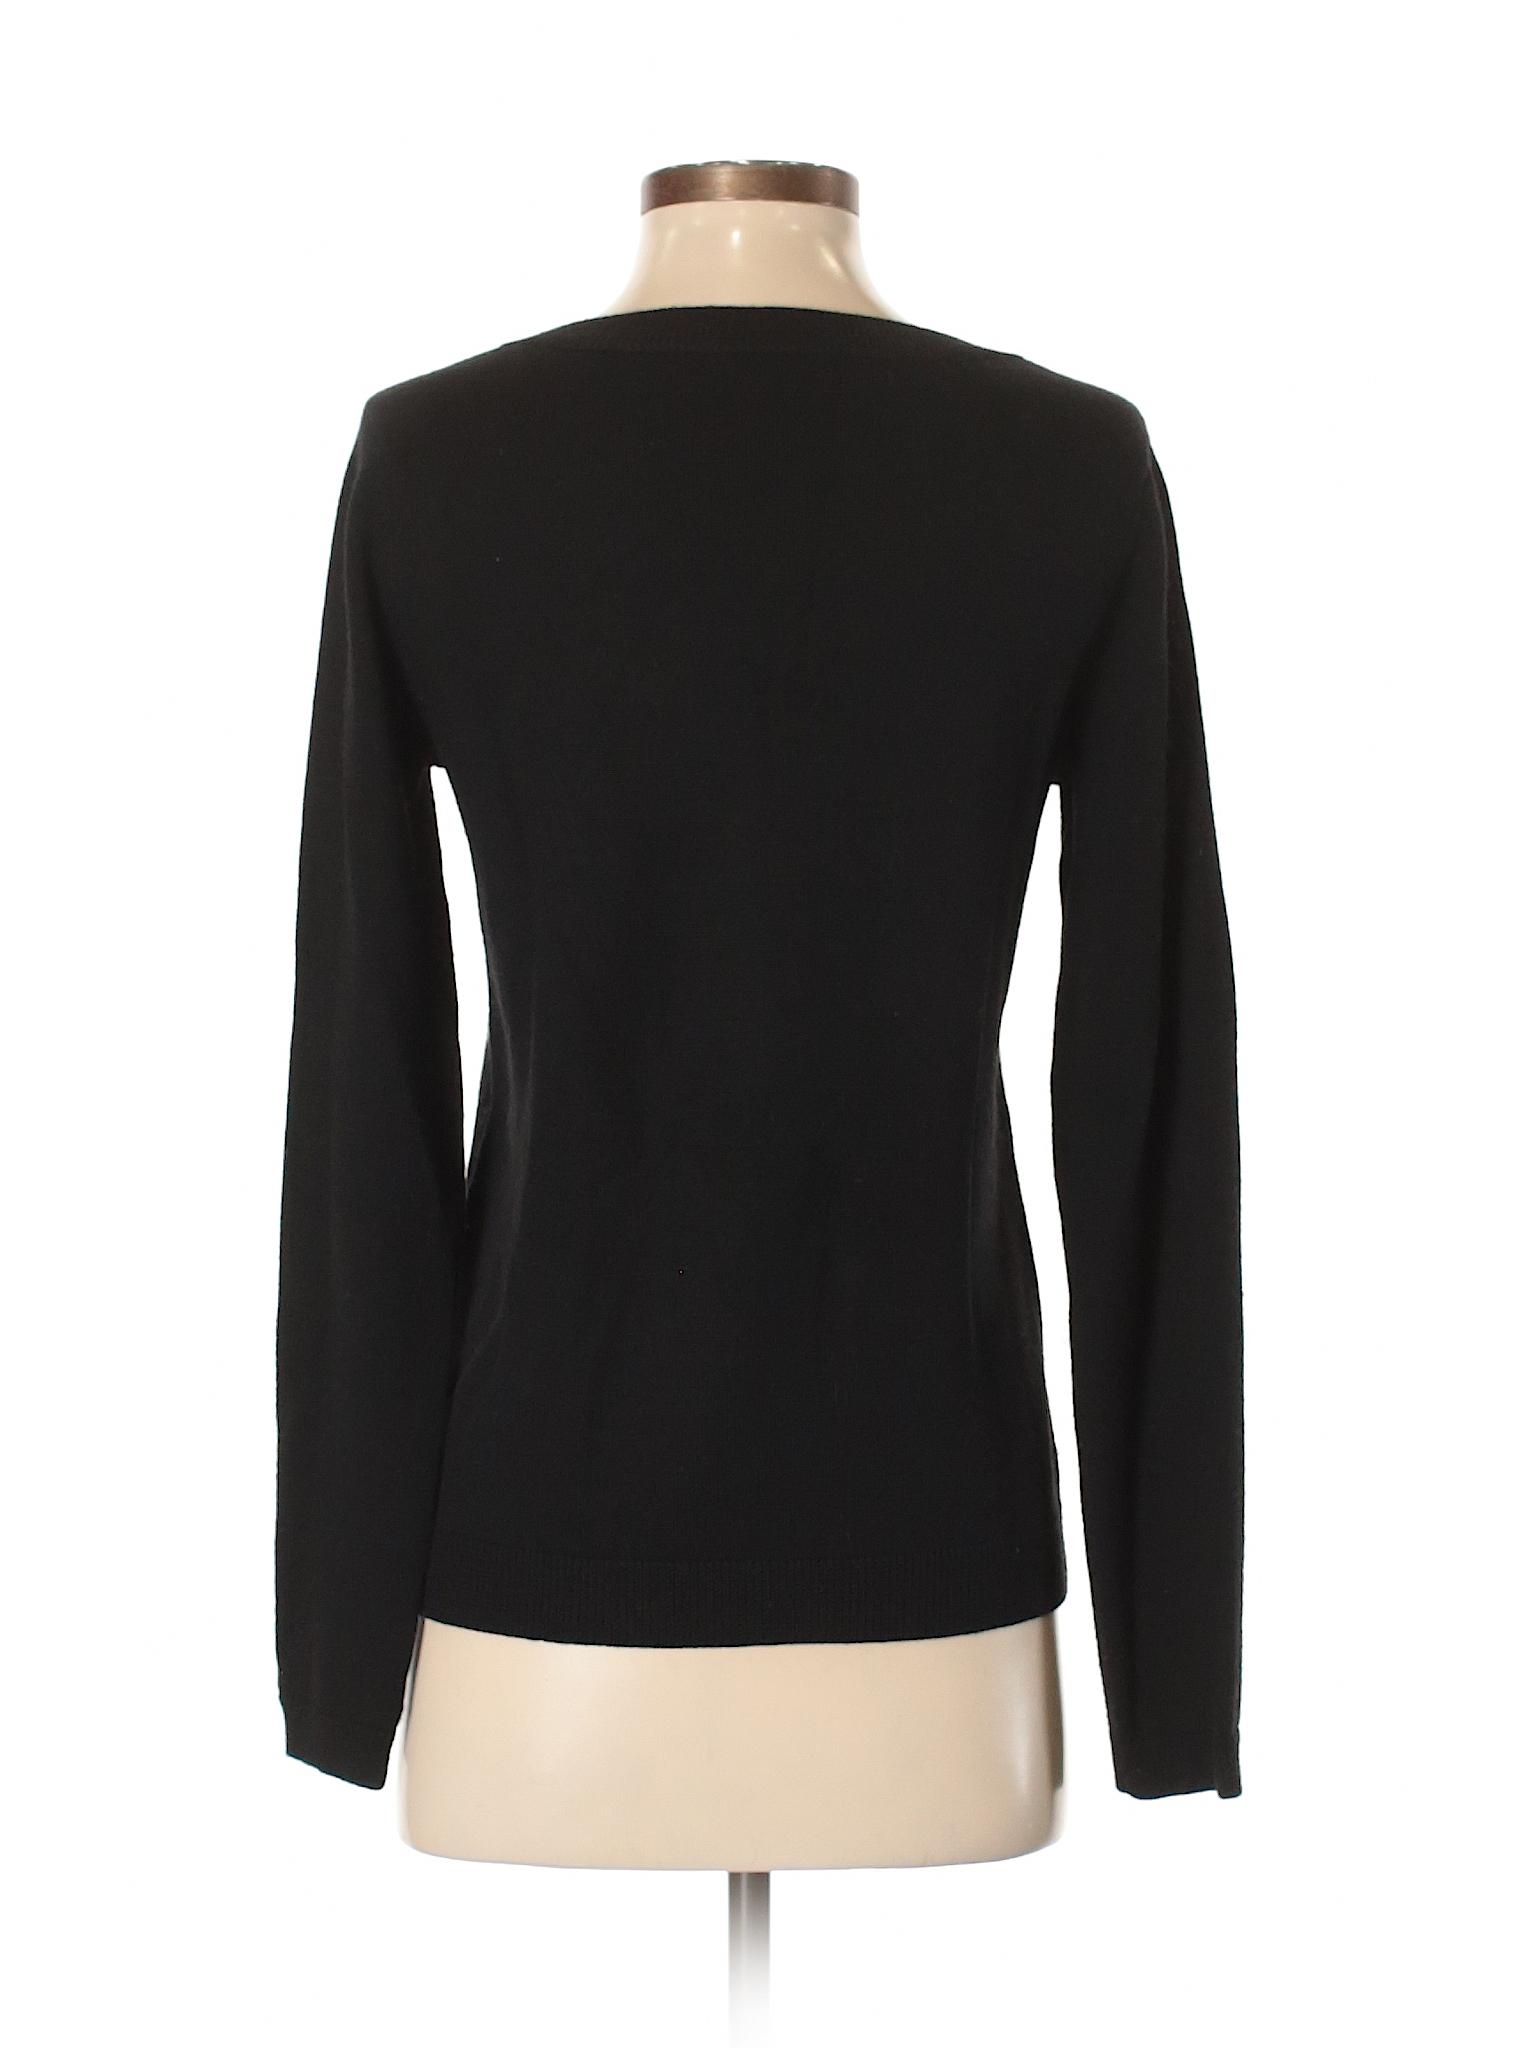 Hill Pullover Sweater Garnet Boutique winter Wool nSap4TwPRW